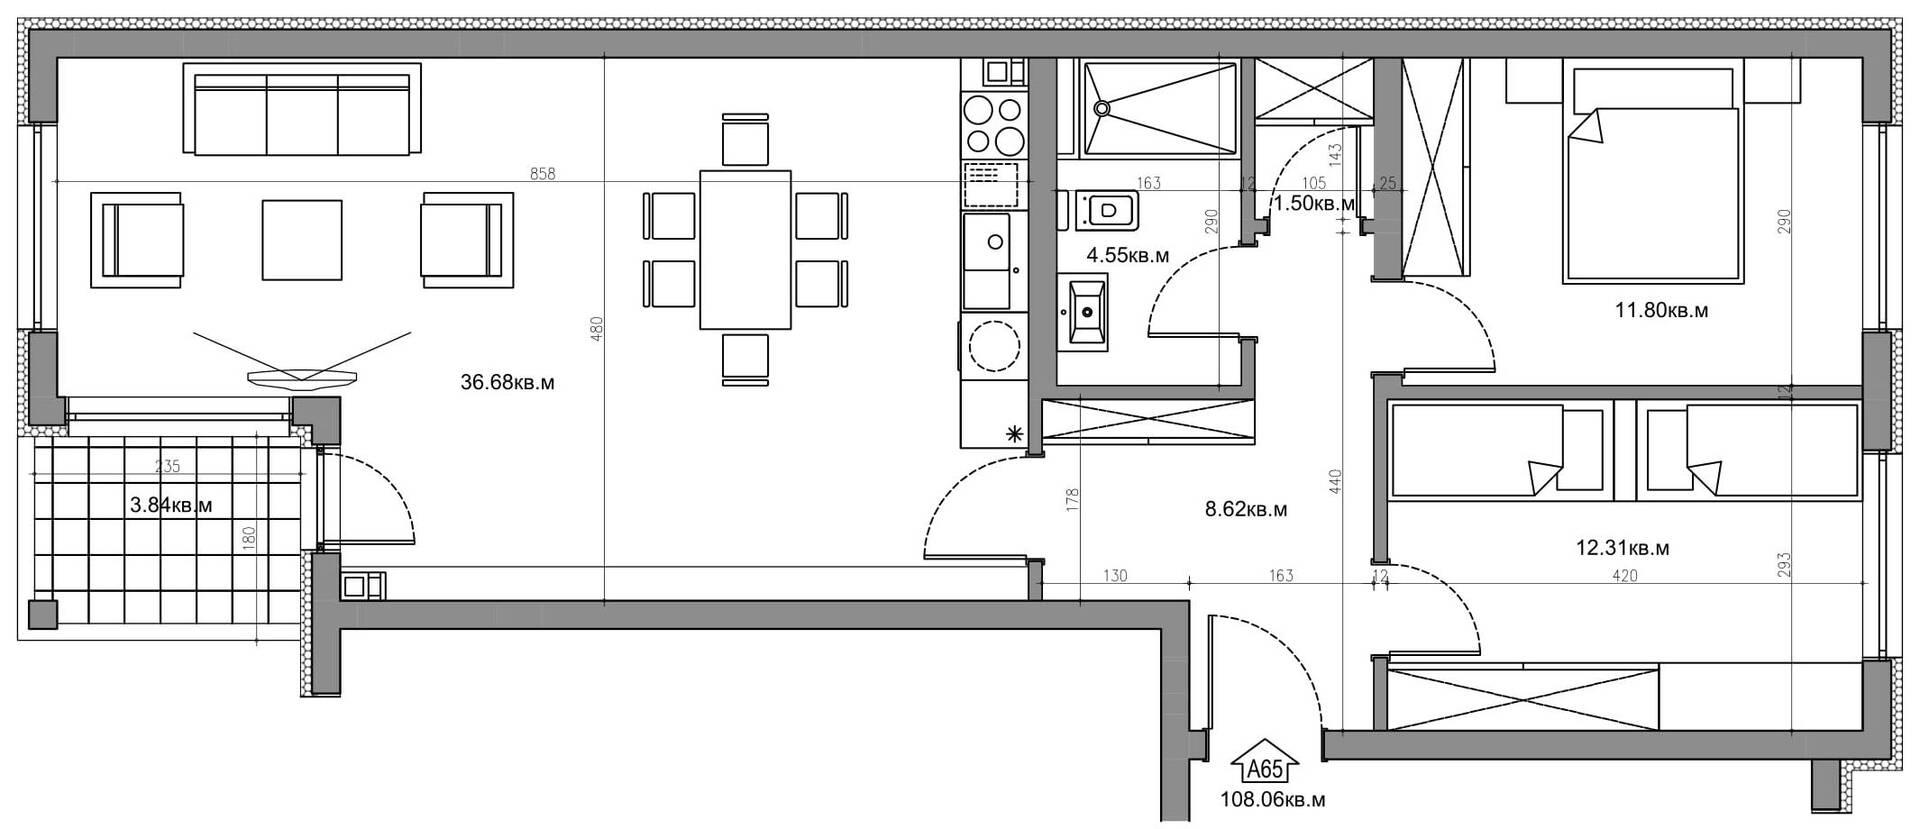 Vinitsa_Apartment_3_65